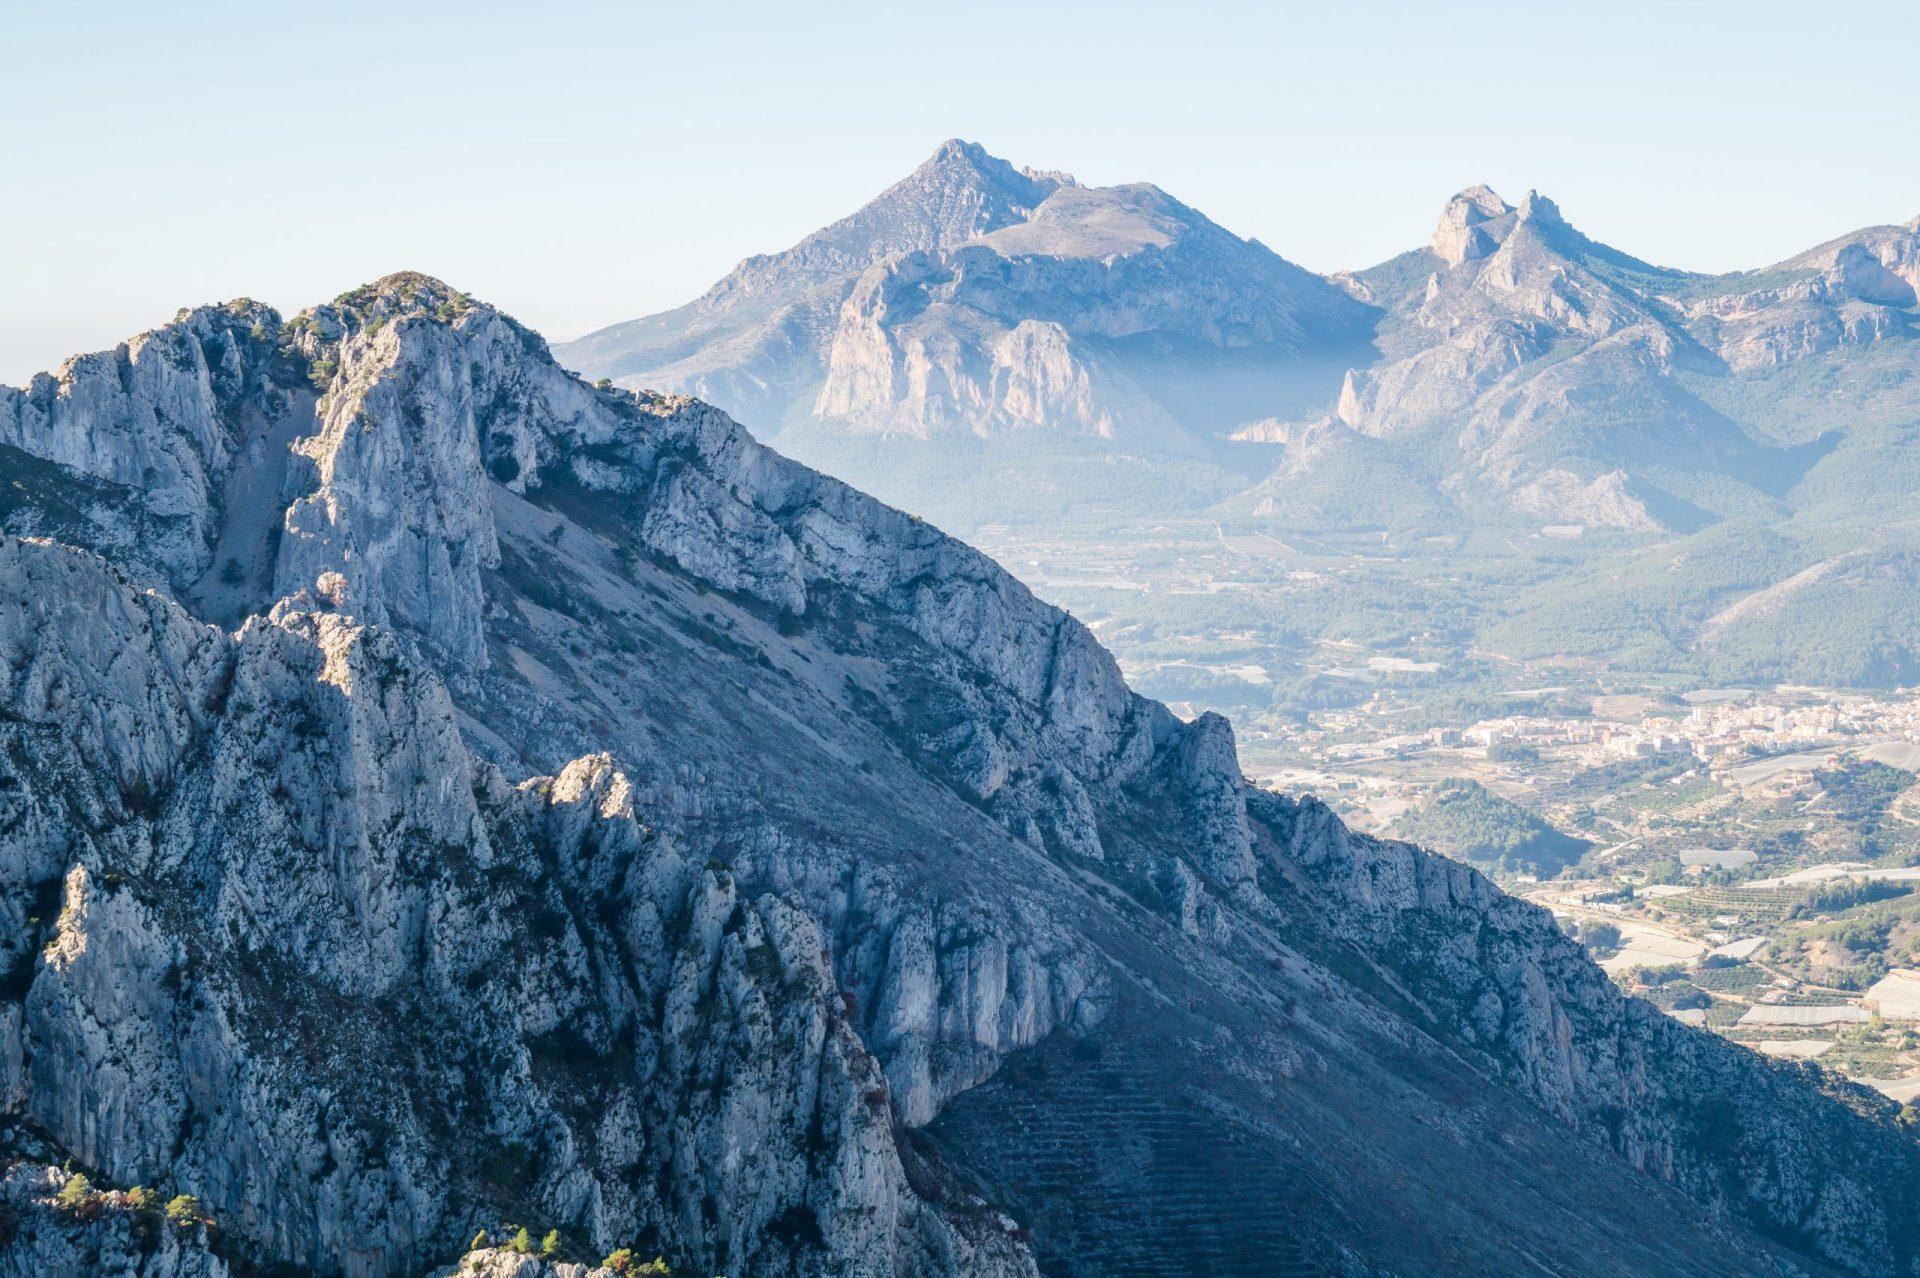 Sierra de Bernia Puig Campana